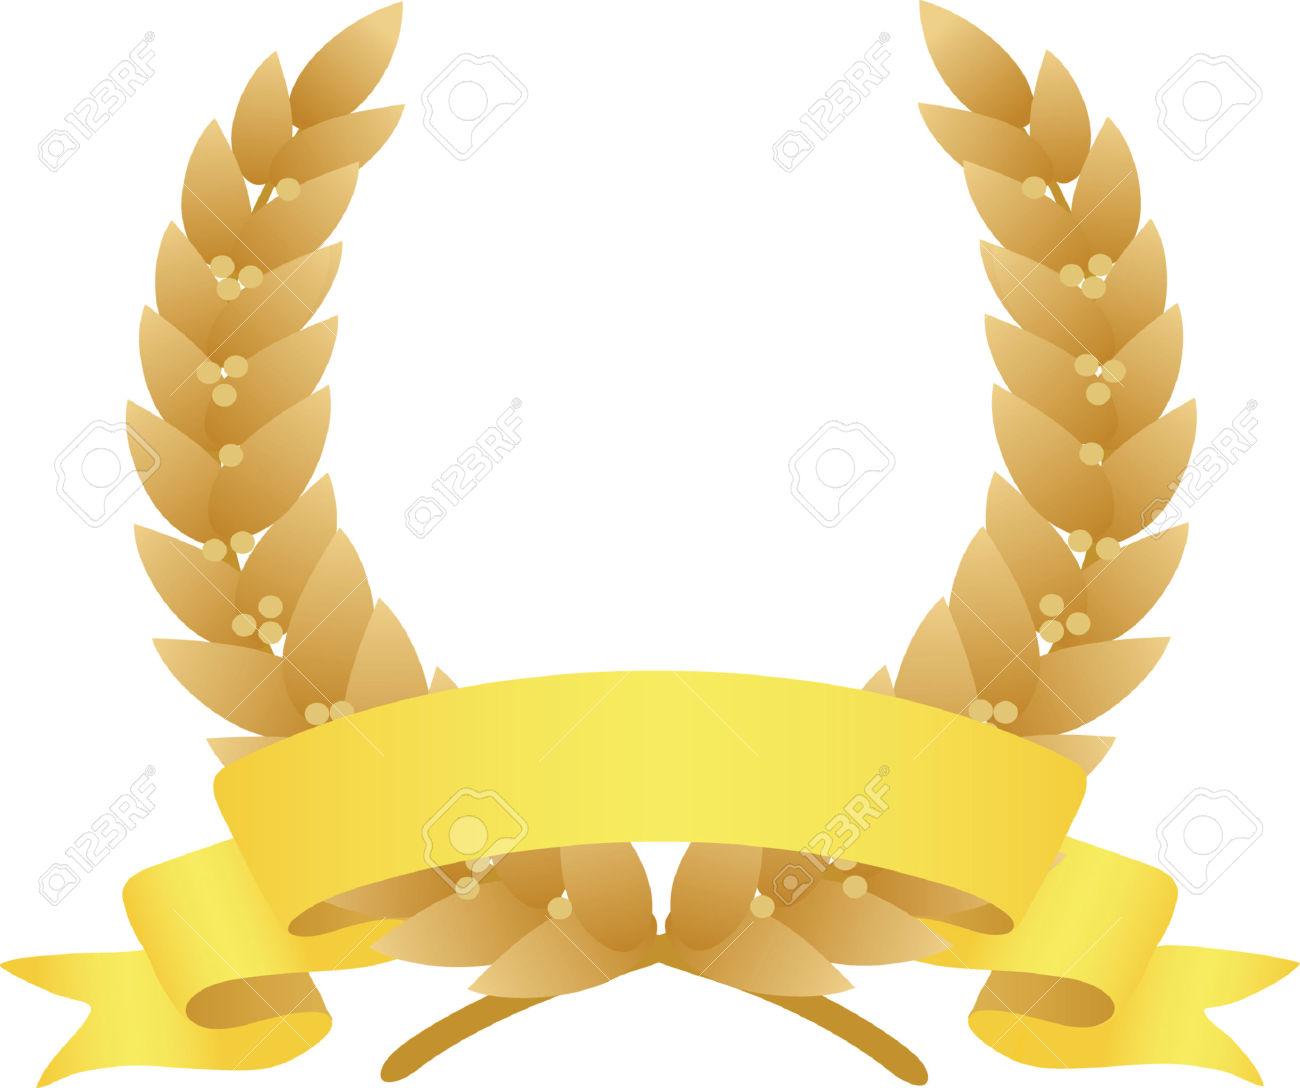 Corona Di Alloro E Nastro. Vector Illustration Clipart Royalty.